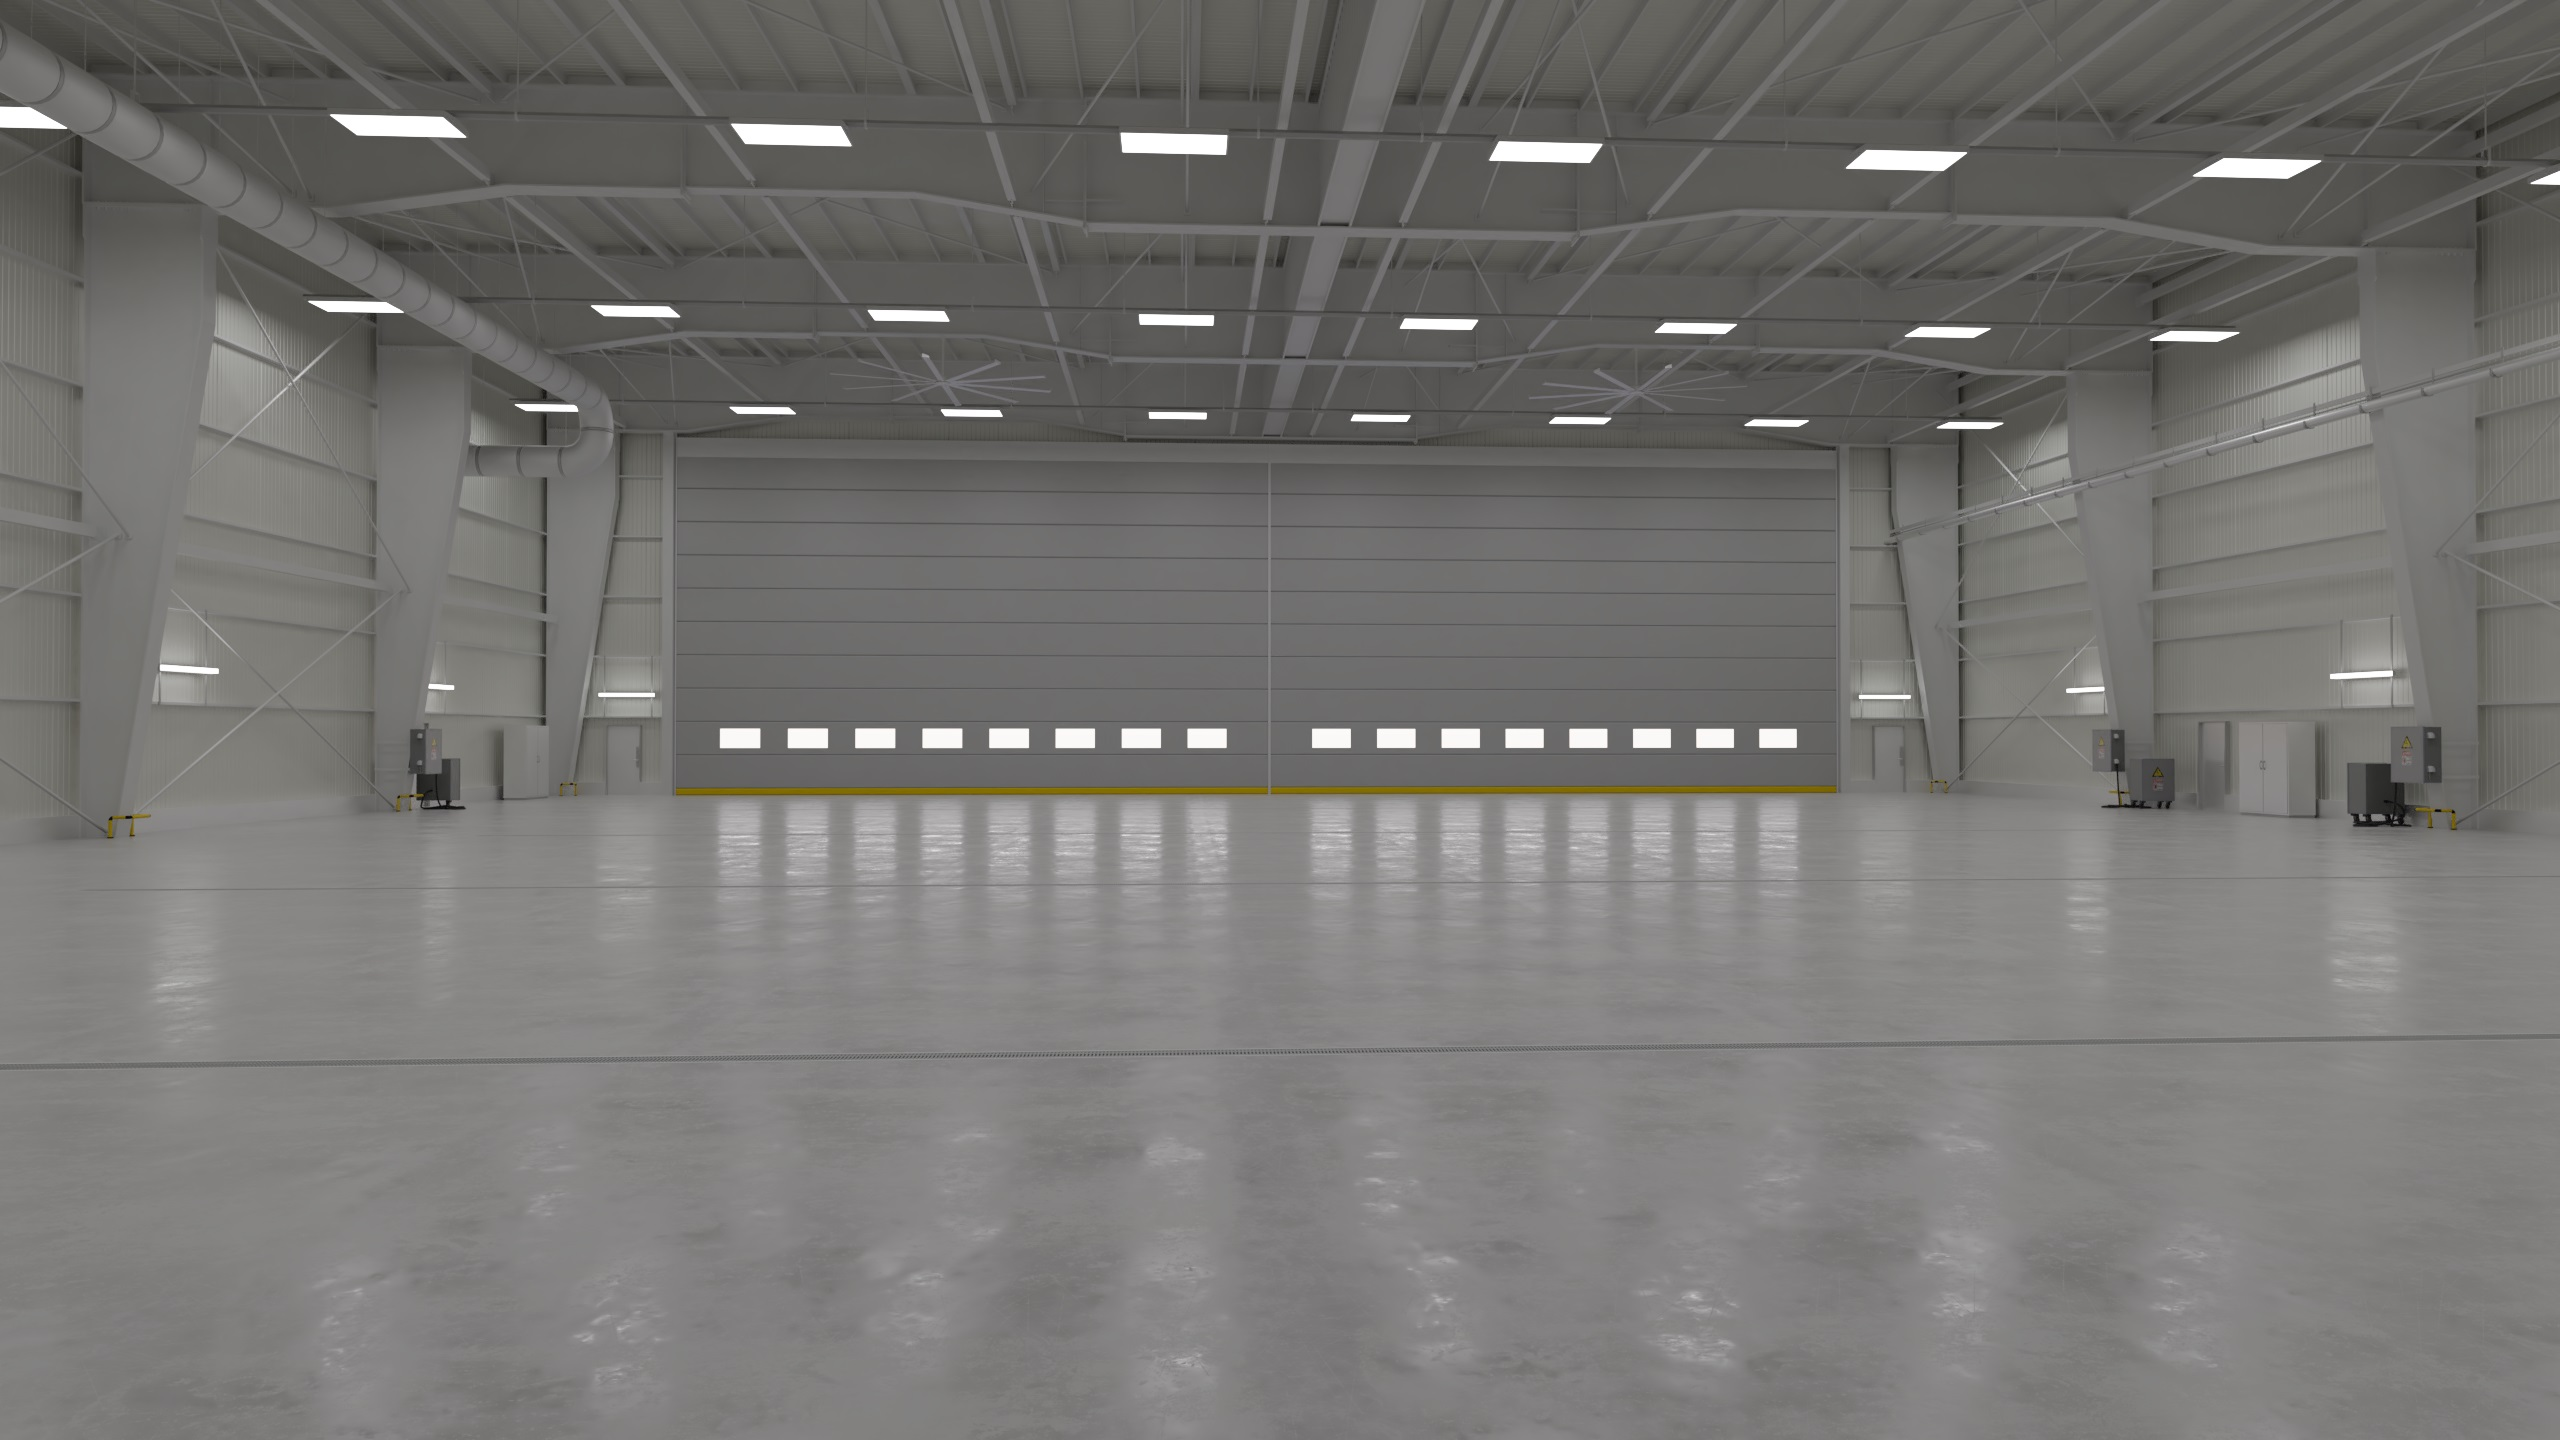 Hangar Interior 1 By Pytorator 3docean